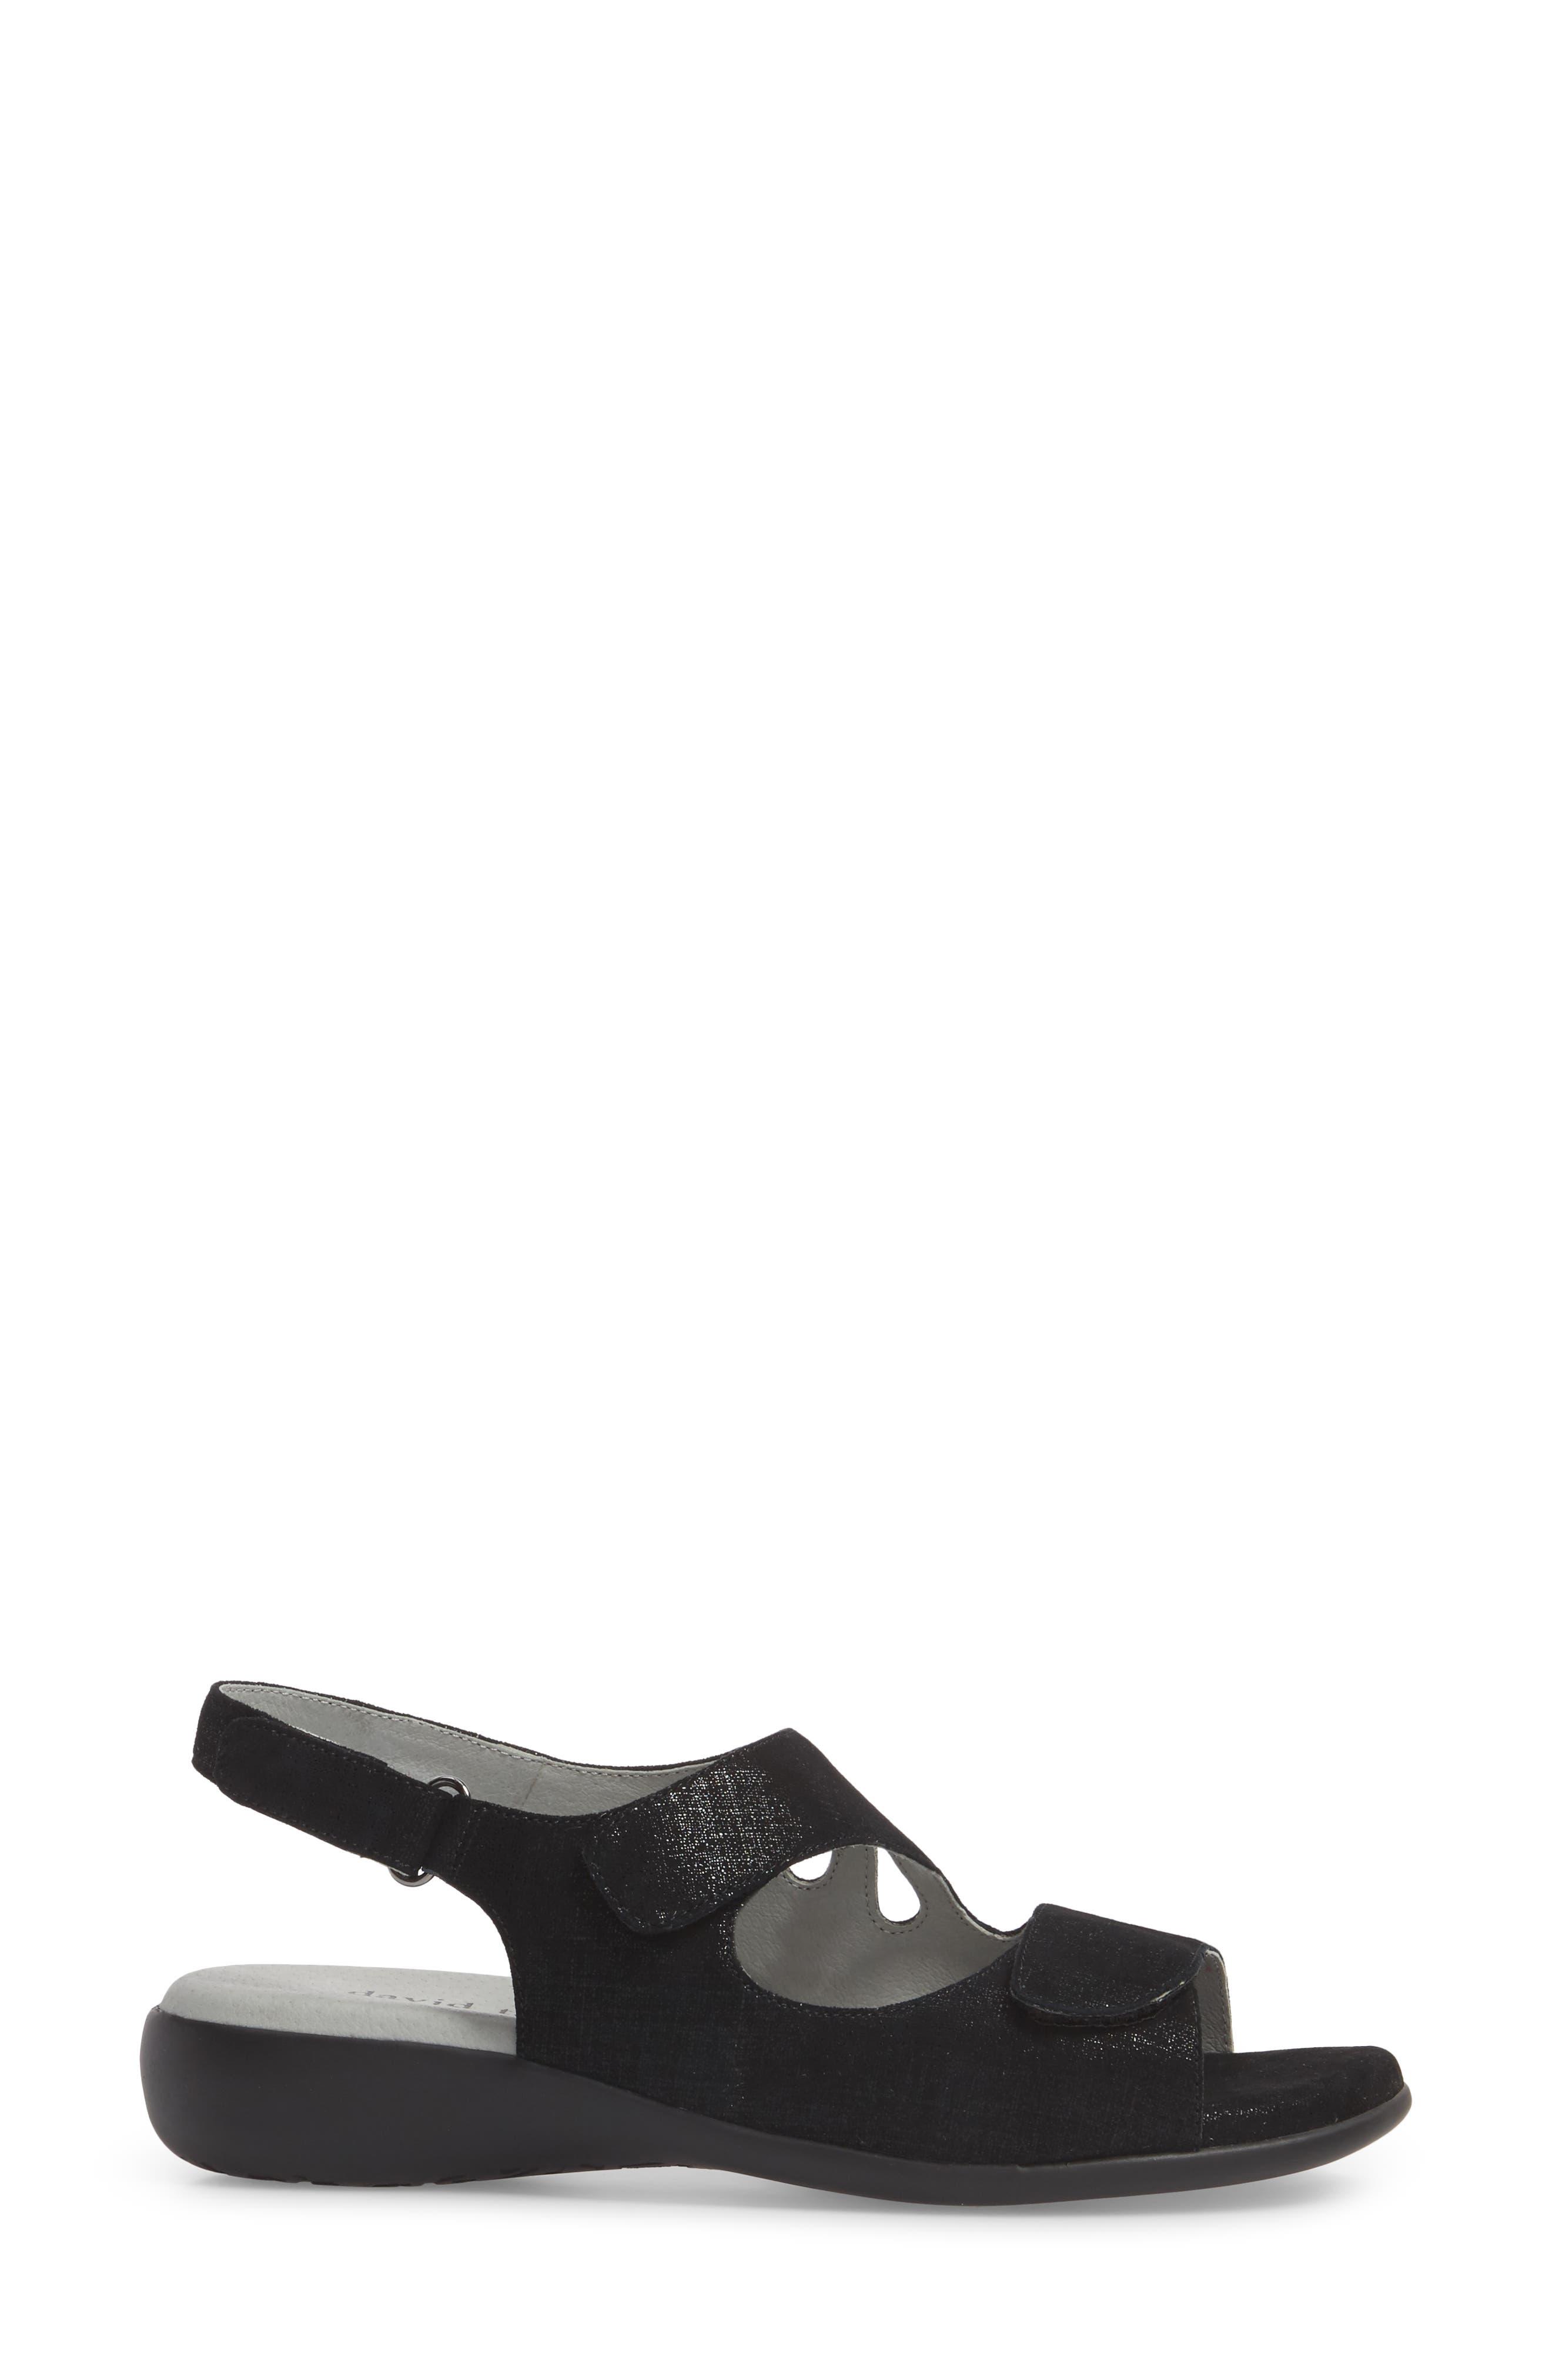 Lilly Slingback Sandal,                             Alternate thumbnail 3, color,                             Black Leather